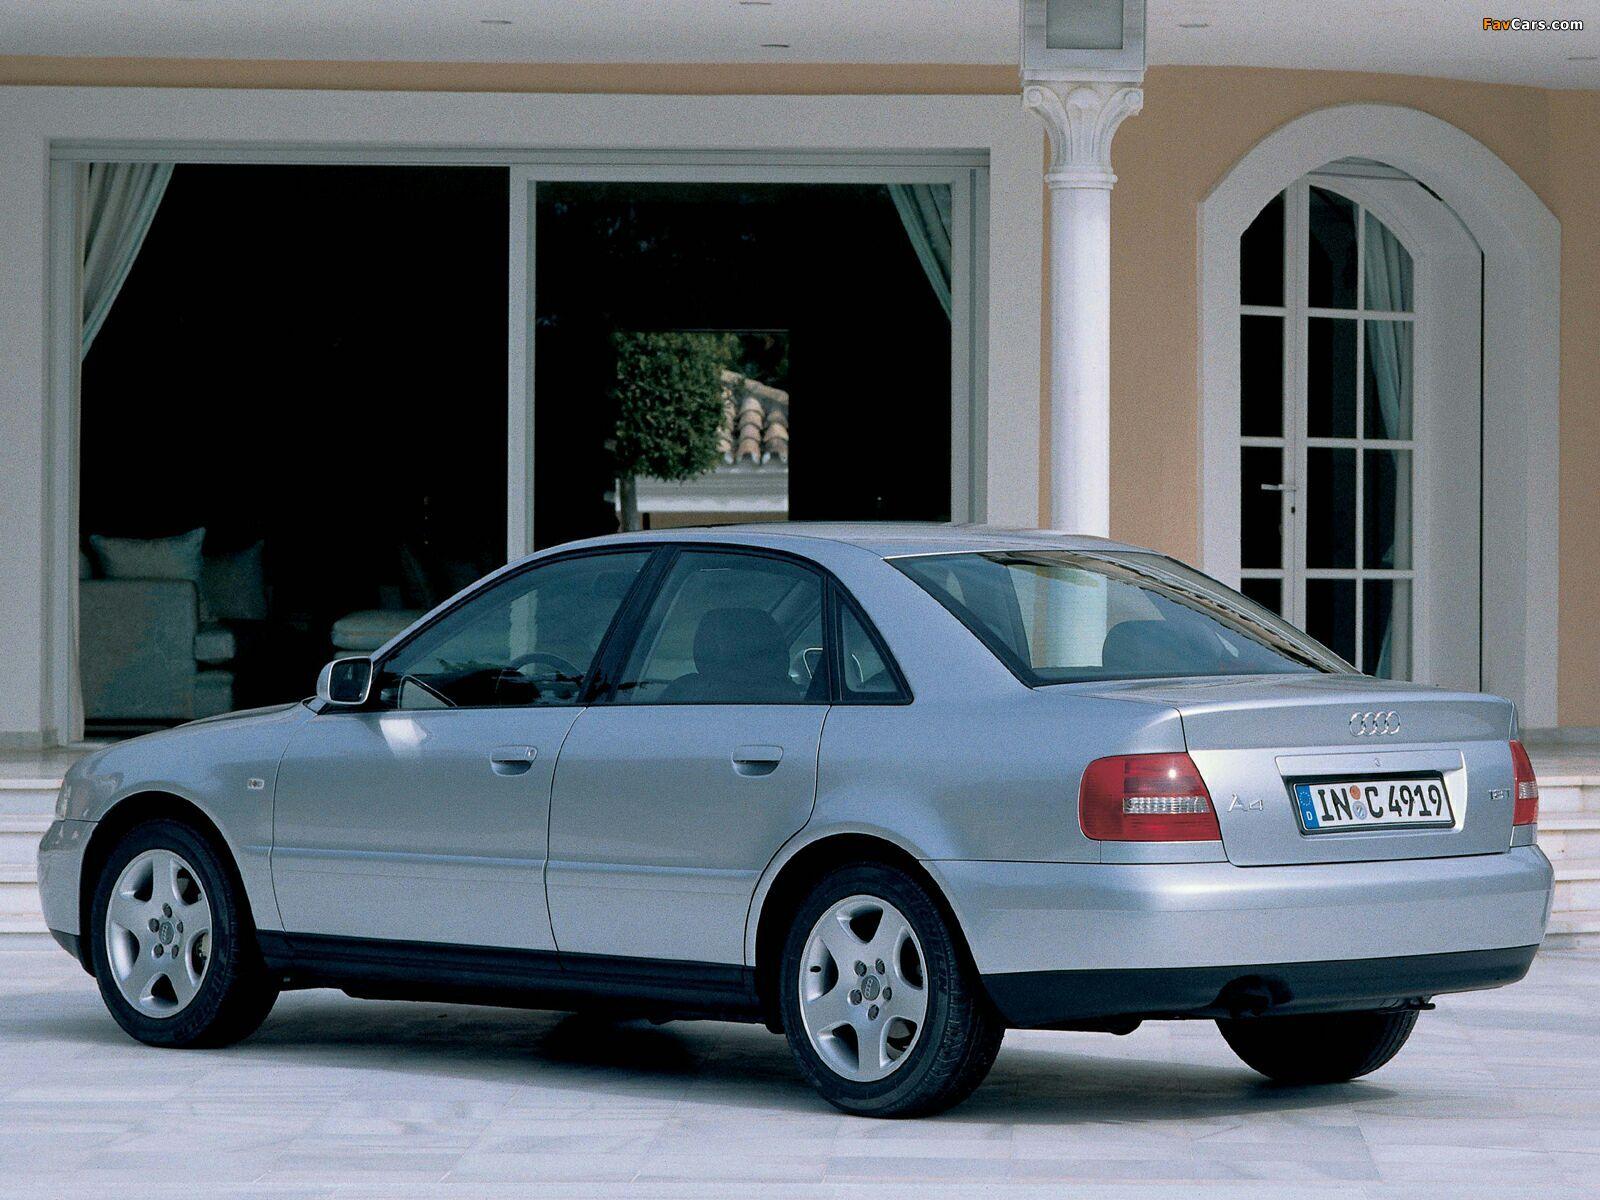 Audi A4 1 8 Tdi Sedan B5 8d 1997 2000 Pictures 1600x1200